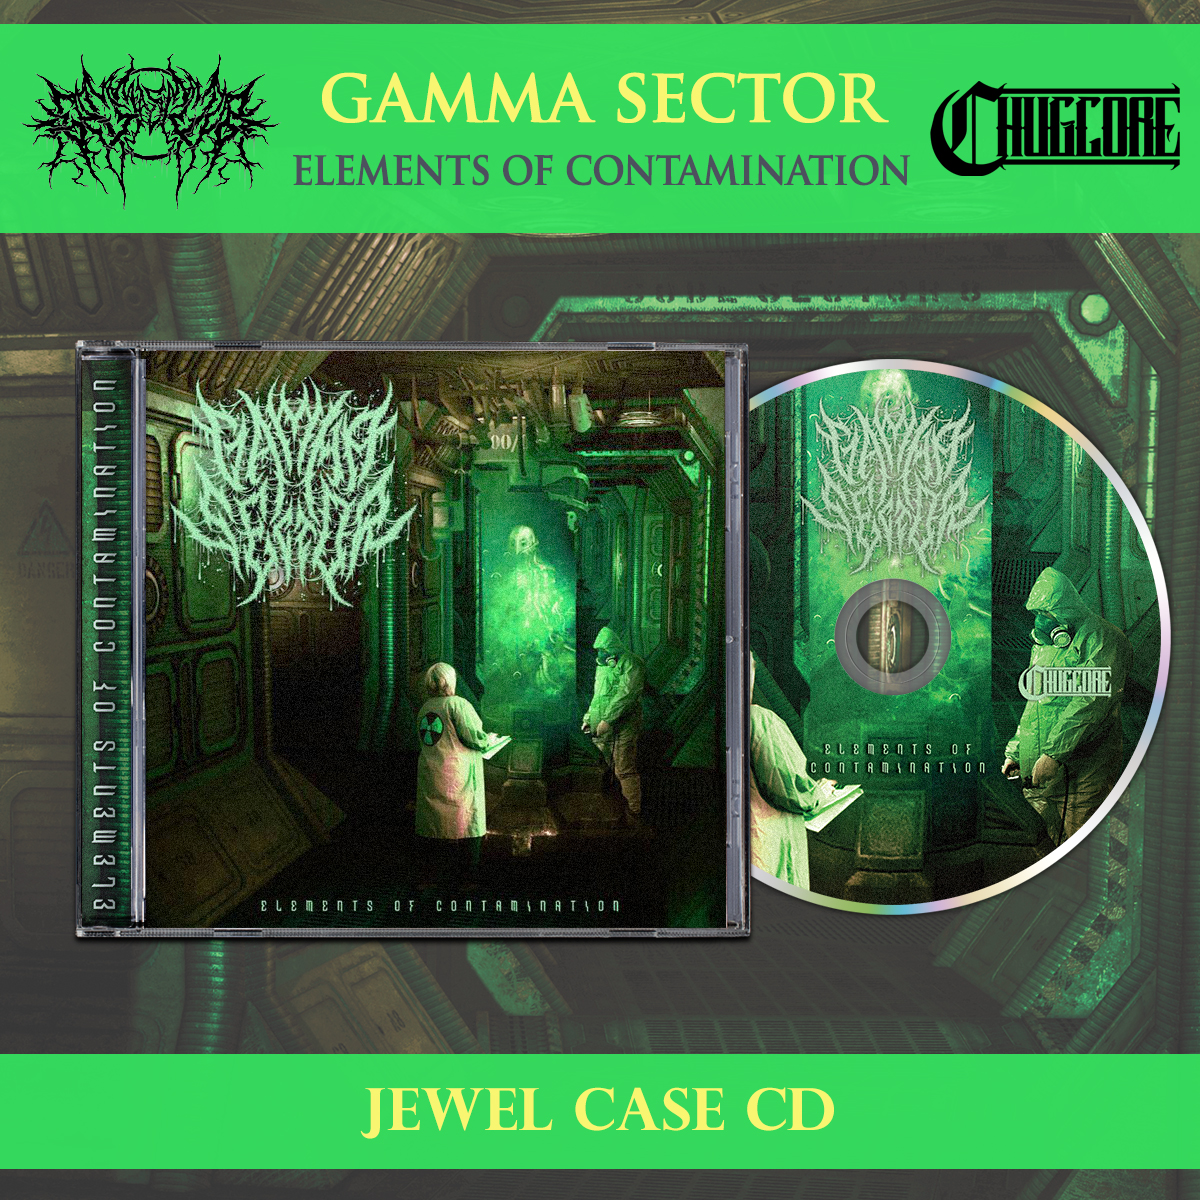 Gamma online shop